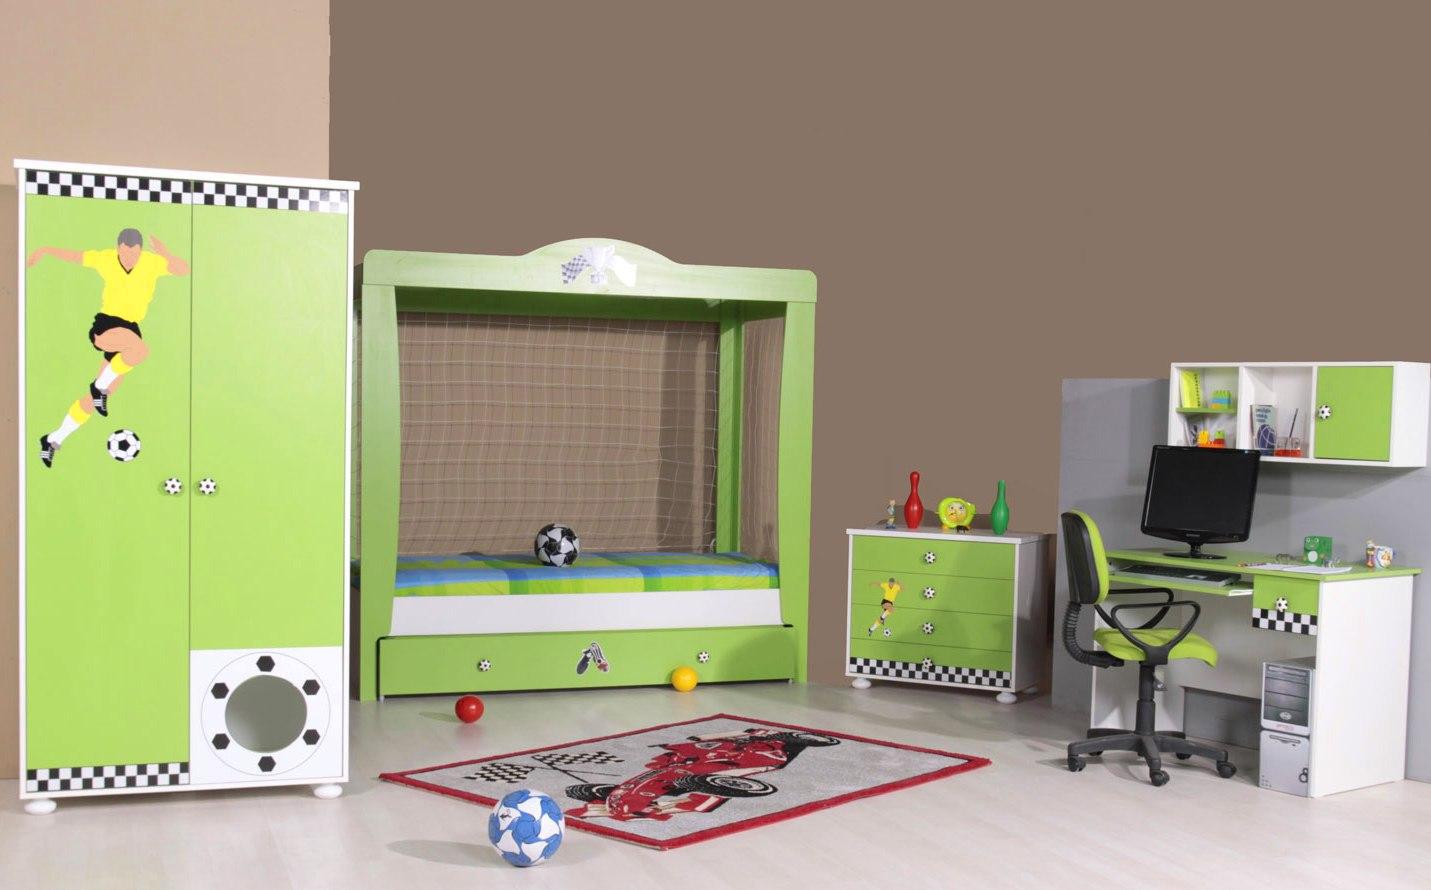 kinderladekast voetbal pro soccer groen / wit kopen? Specialist in ...